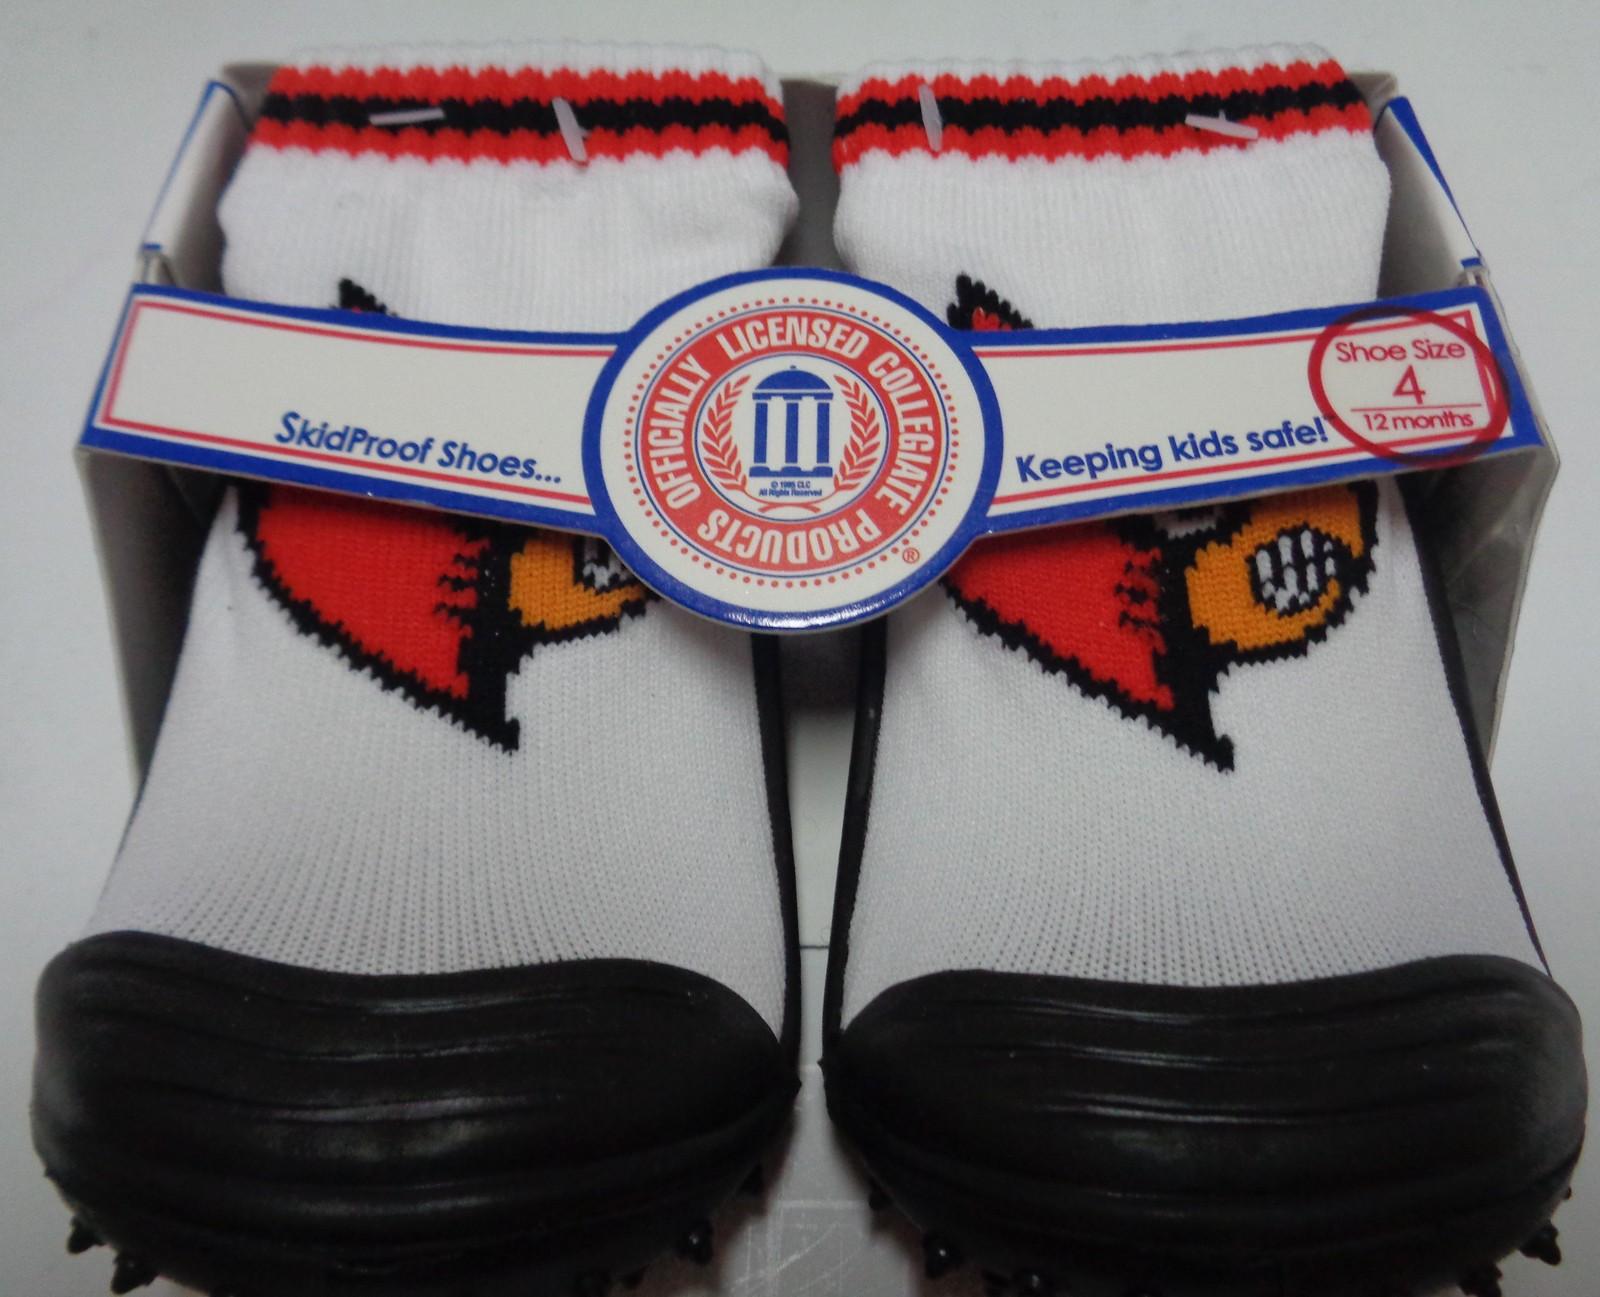 Skidders Toddlers No Skid Shoes Louisville Kentucky Cardinals NWT Sz 4/12 Months